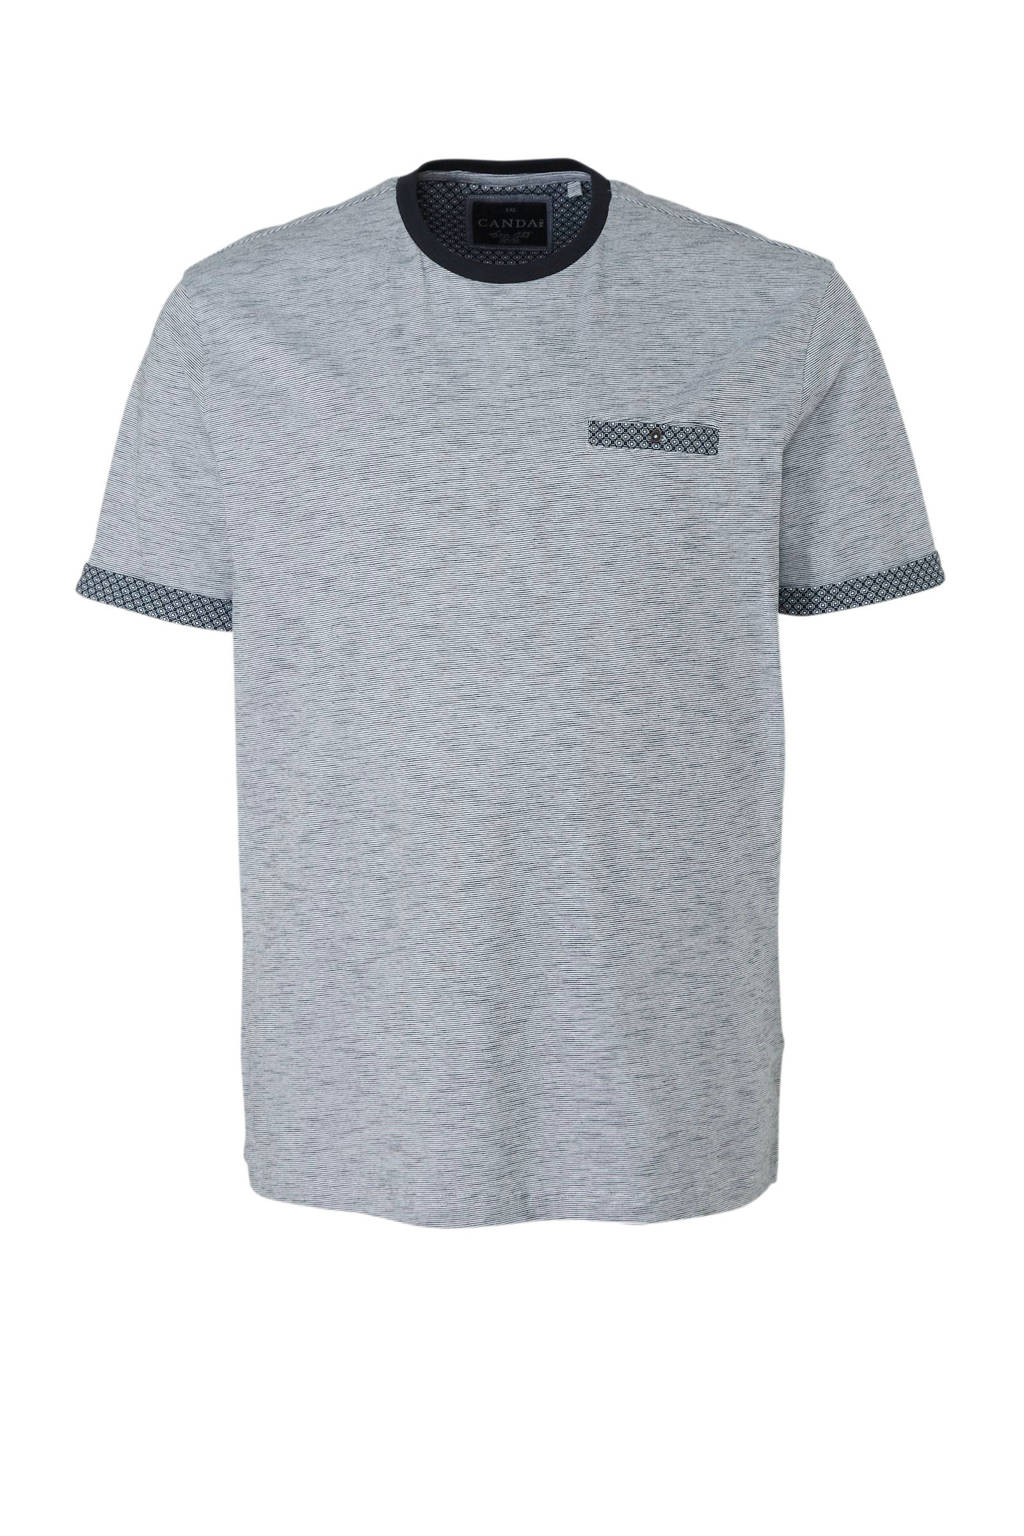 C&A XL Canda T-shirt gestreept, Blauw/wit